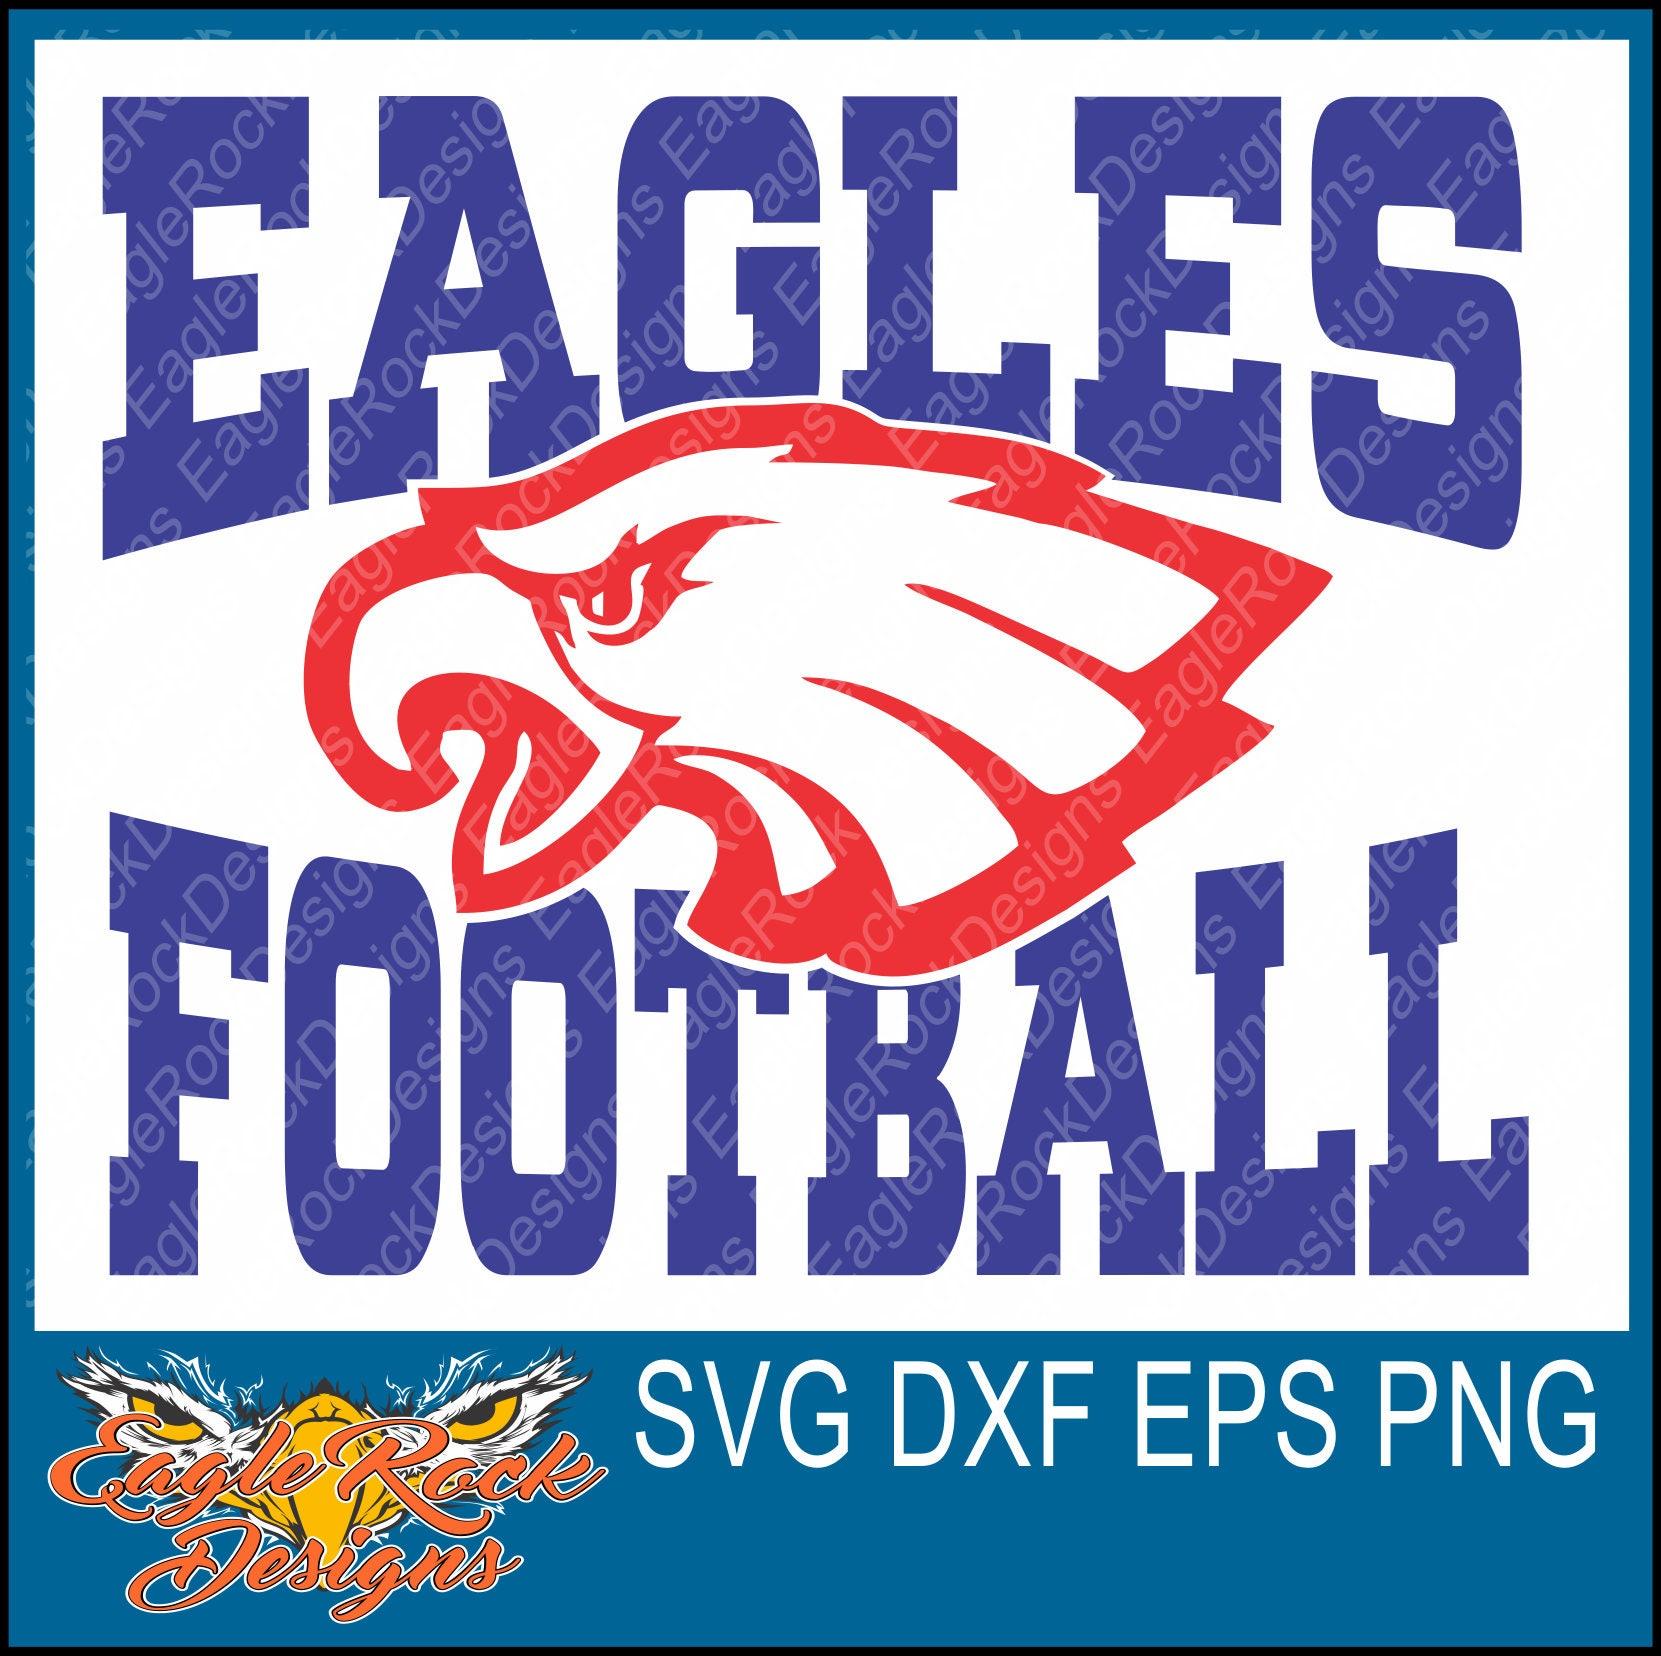 Eagles Football Svg Dxf Eps Png Cut File Eagles Etsy